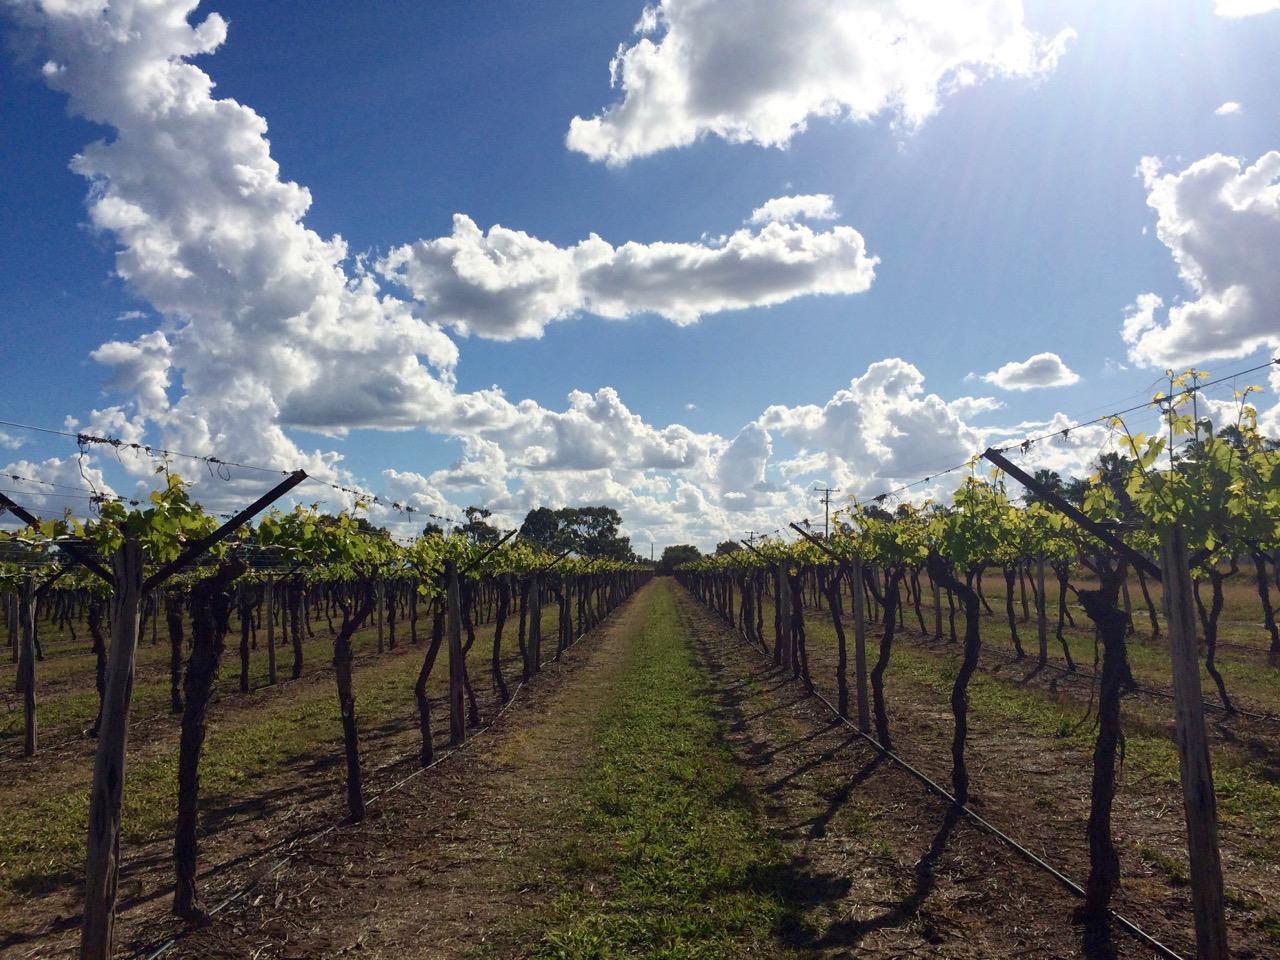 The vineyard.